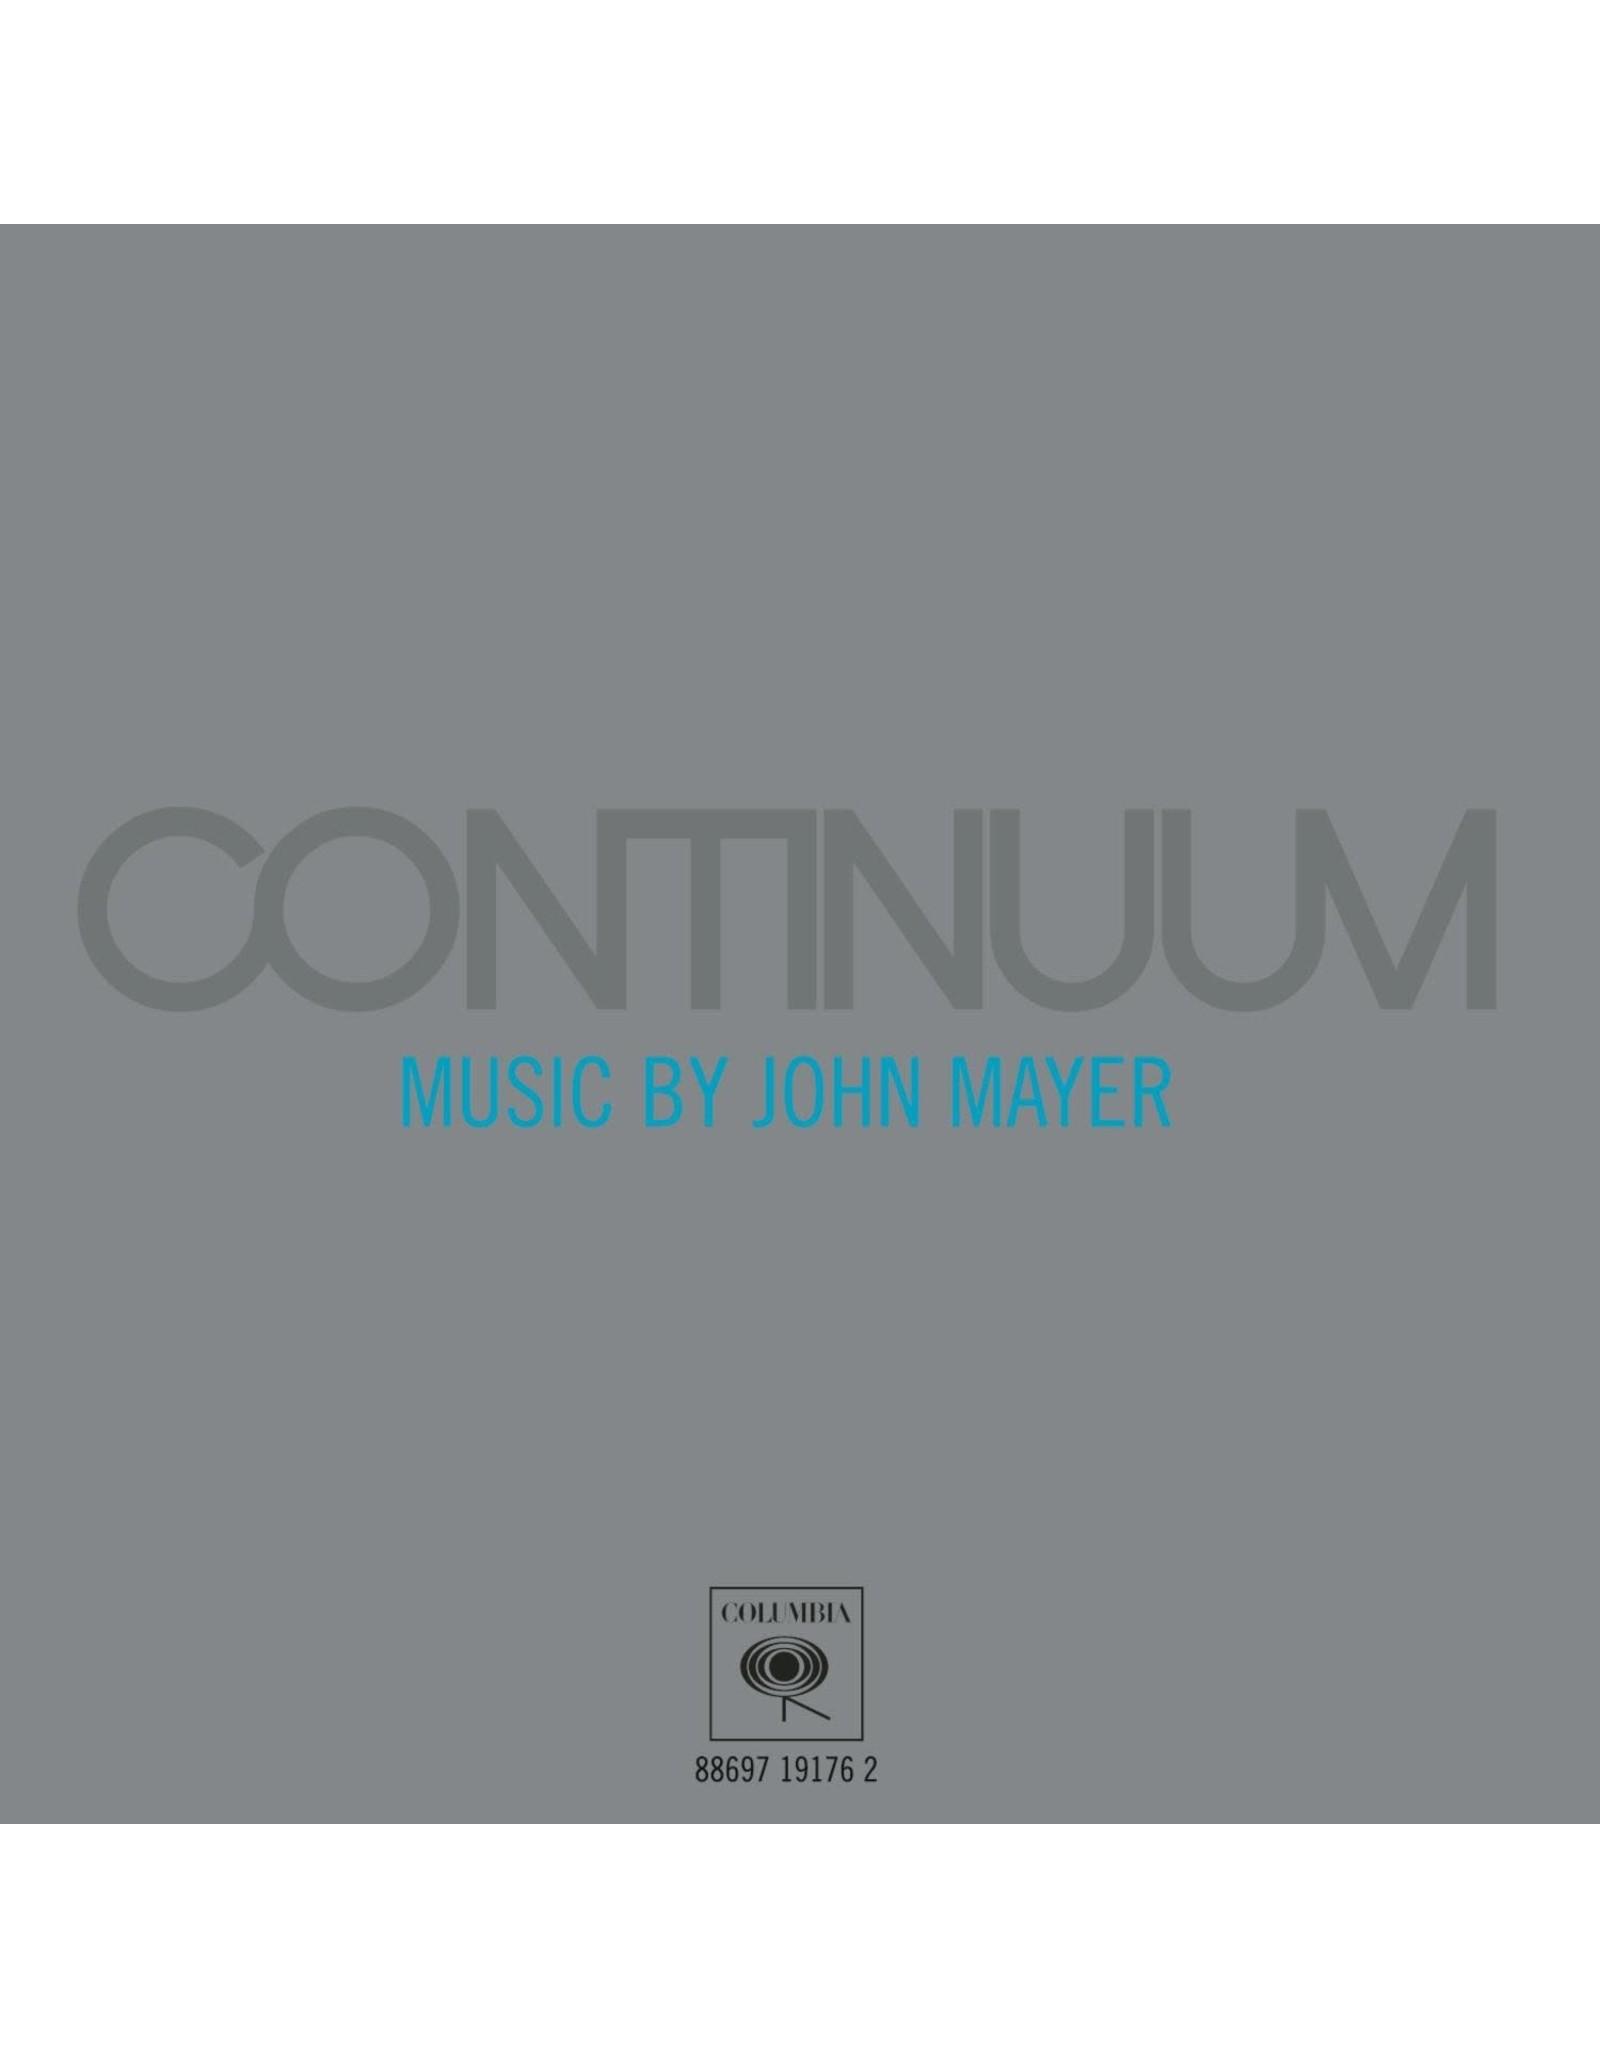 John Mayer - Continuum (Music On Vinyl)